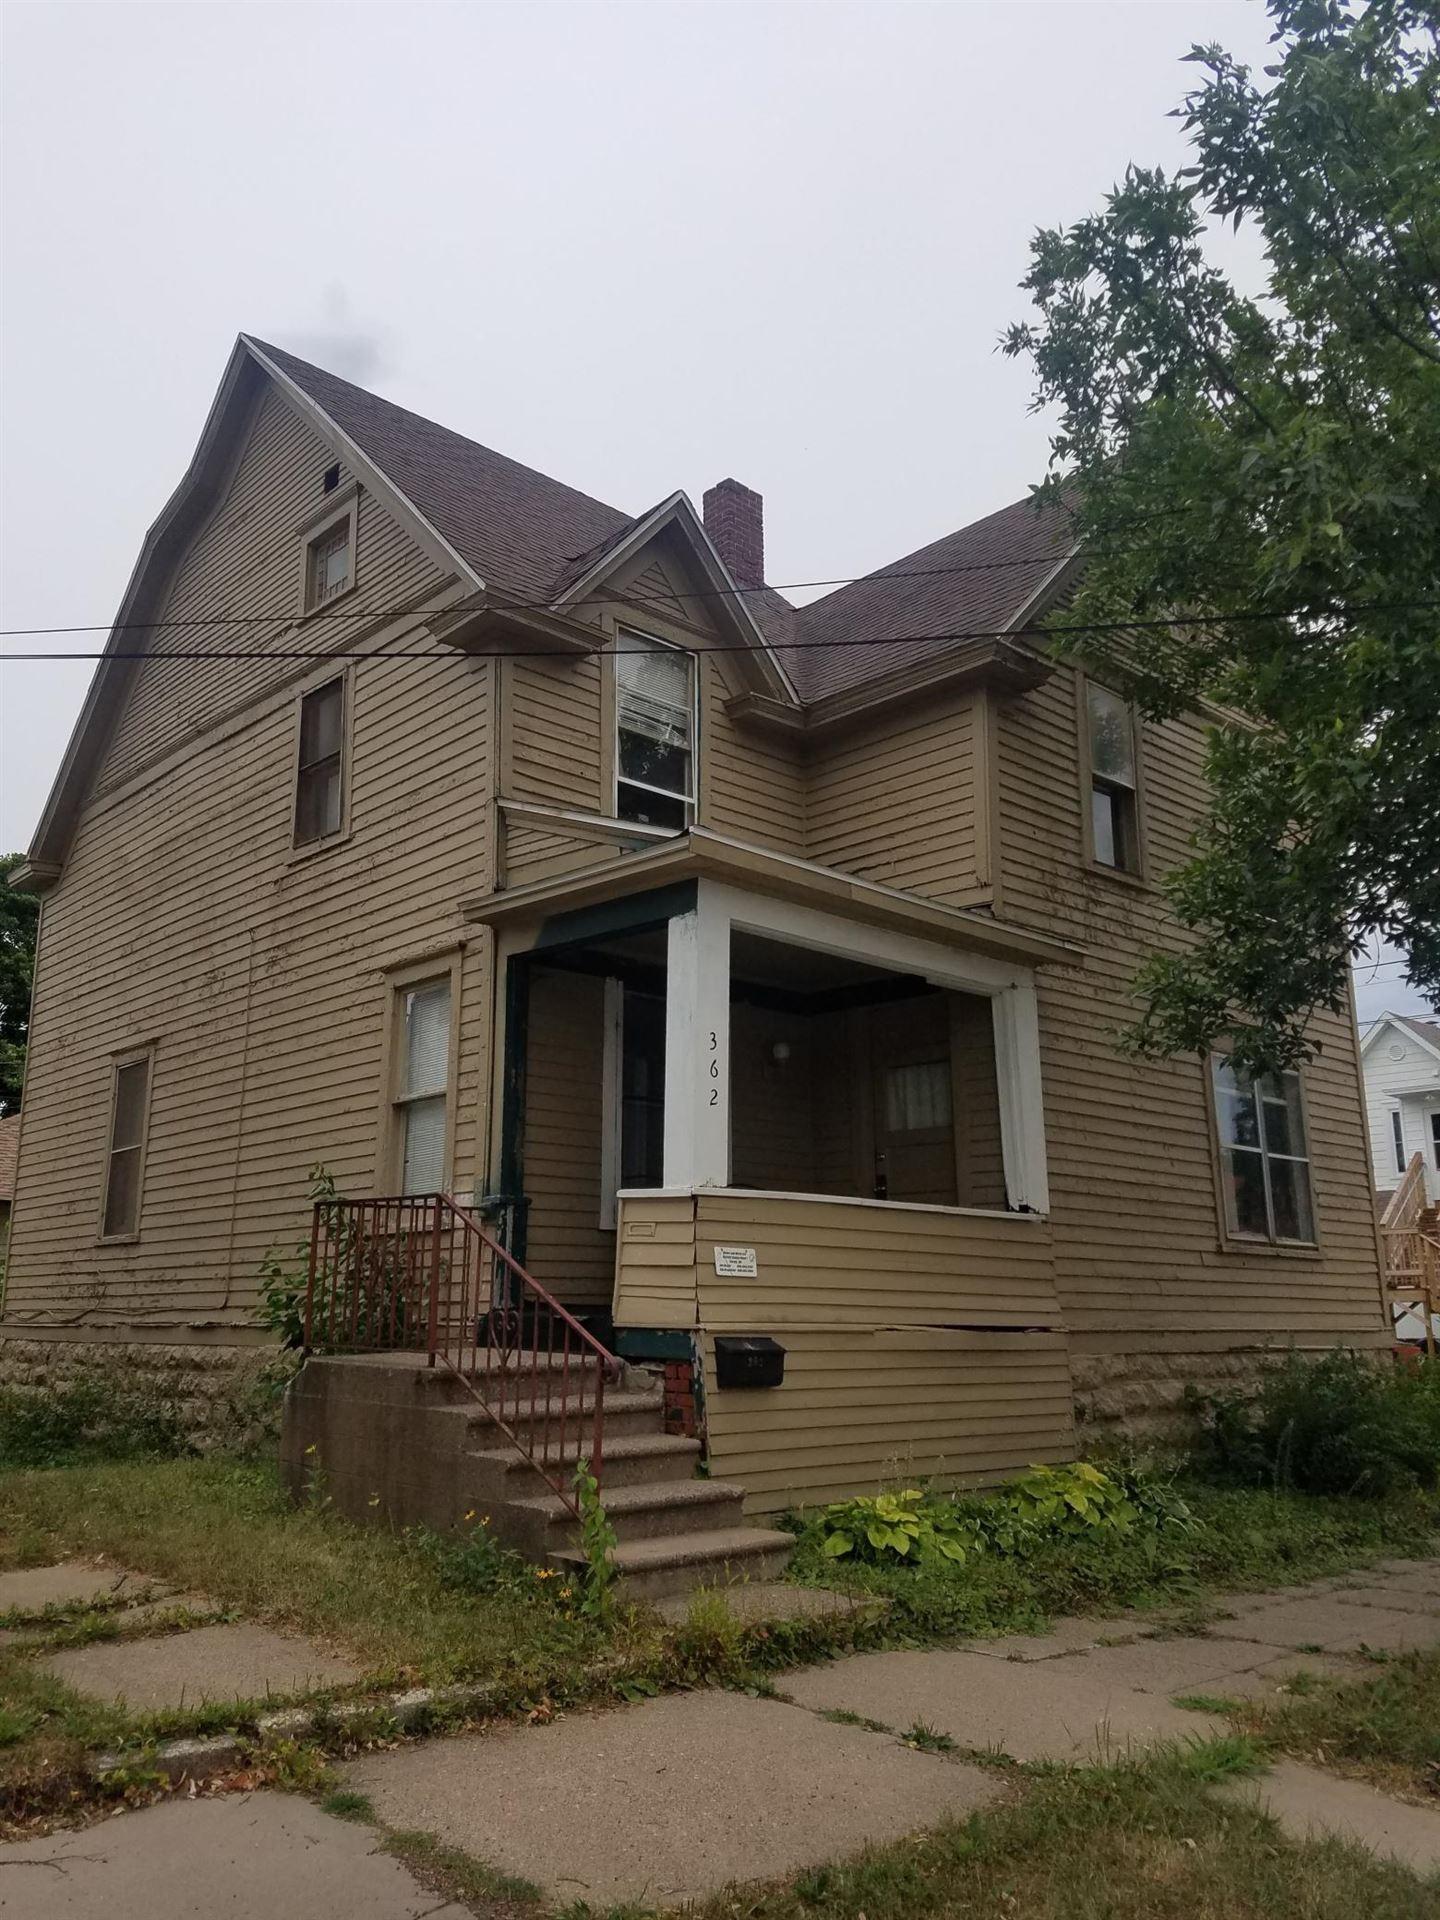 362 Cummings Street, Winona, MN 55987 - MLS#: 5665821